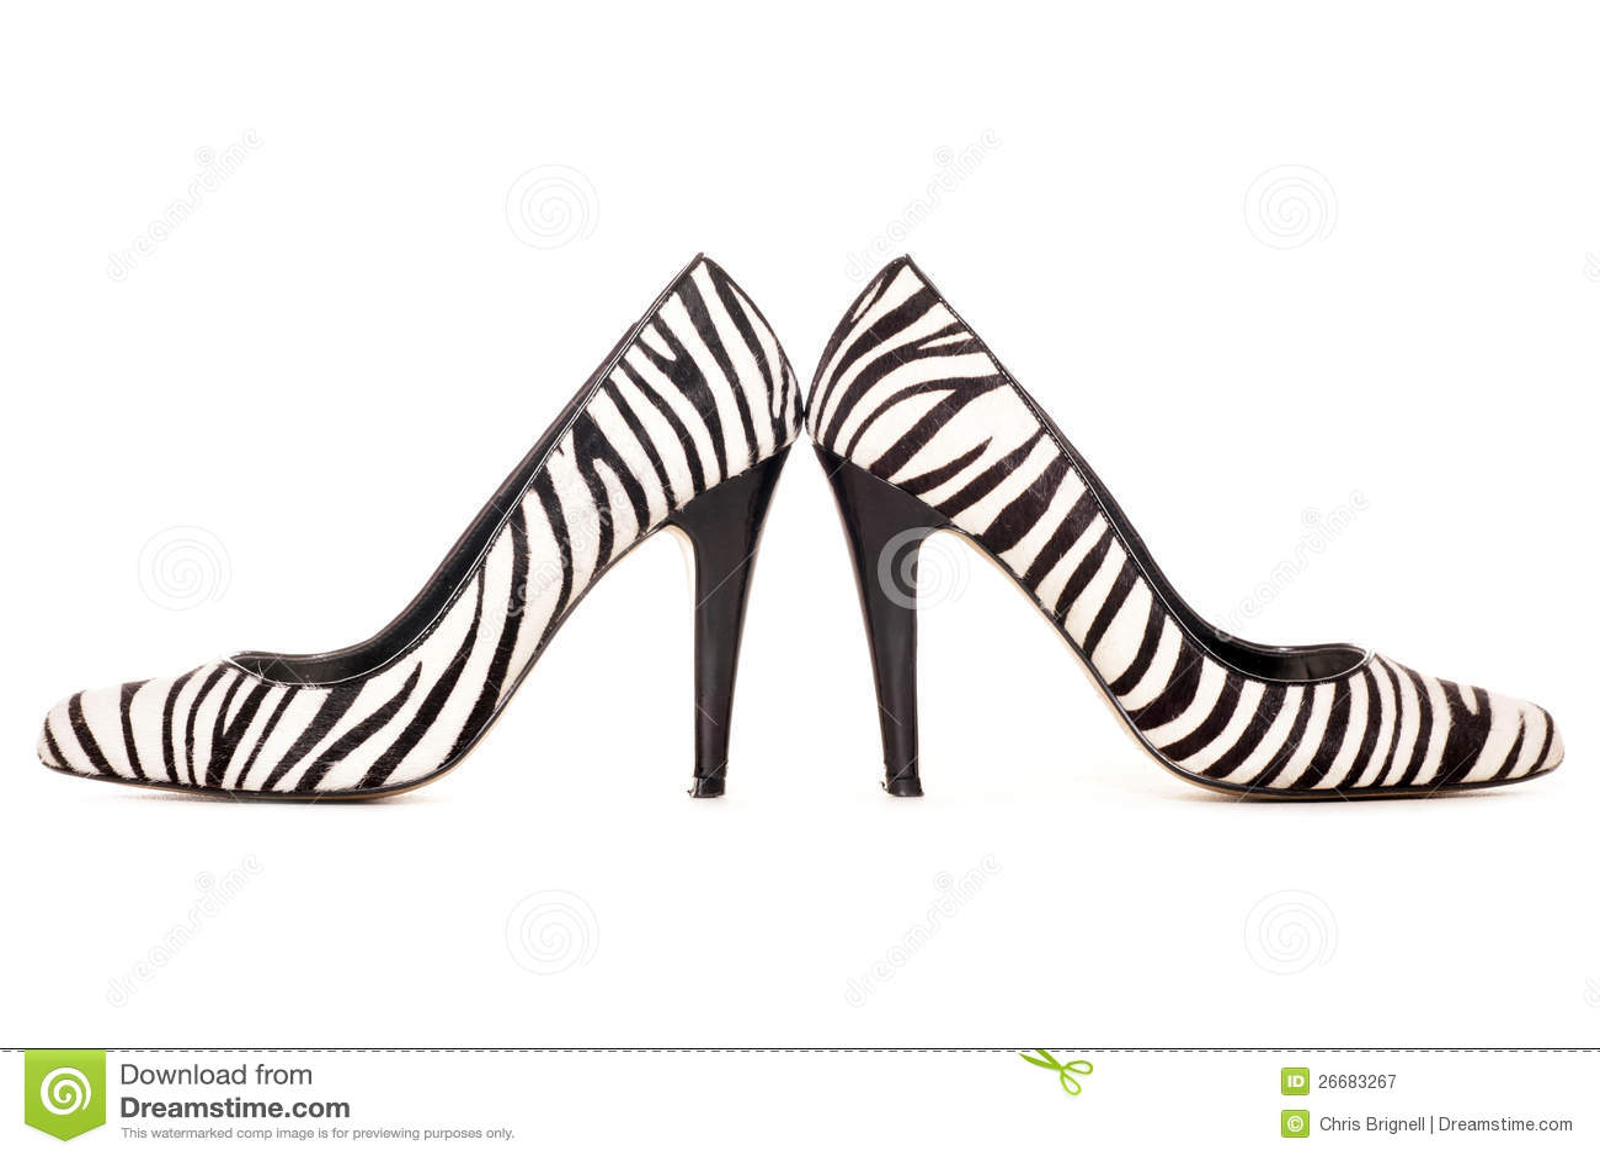 Zebra Pattern High Heel Shoes Stock Image Image Of Pattern High